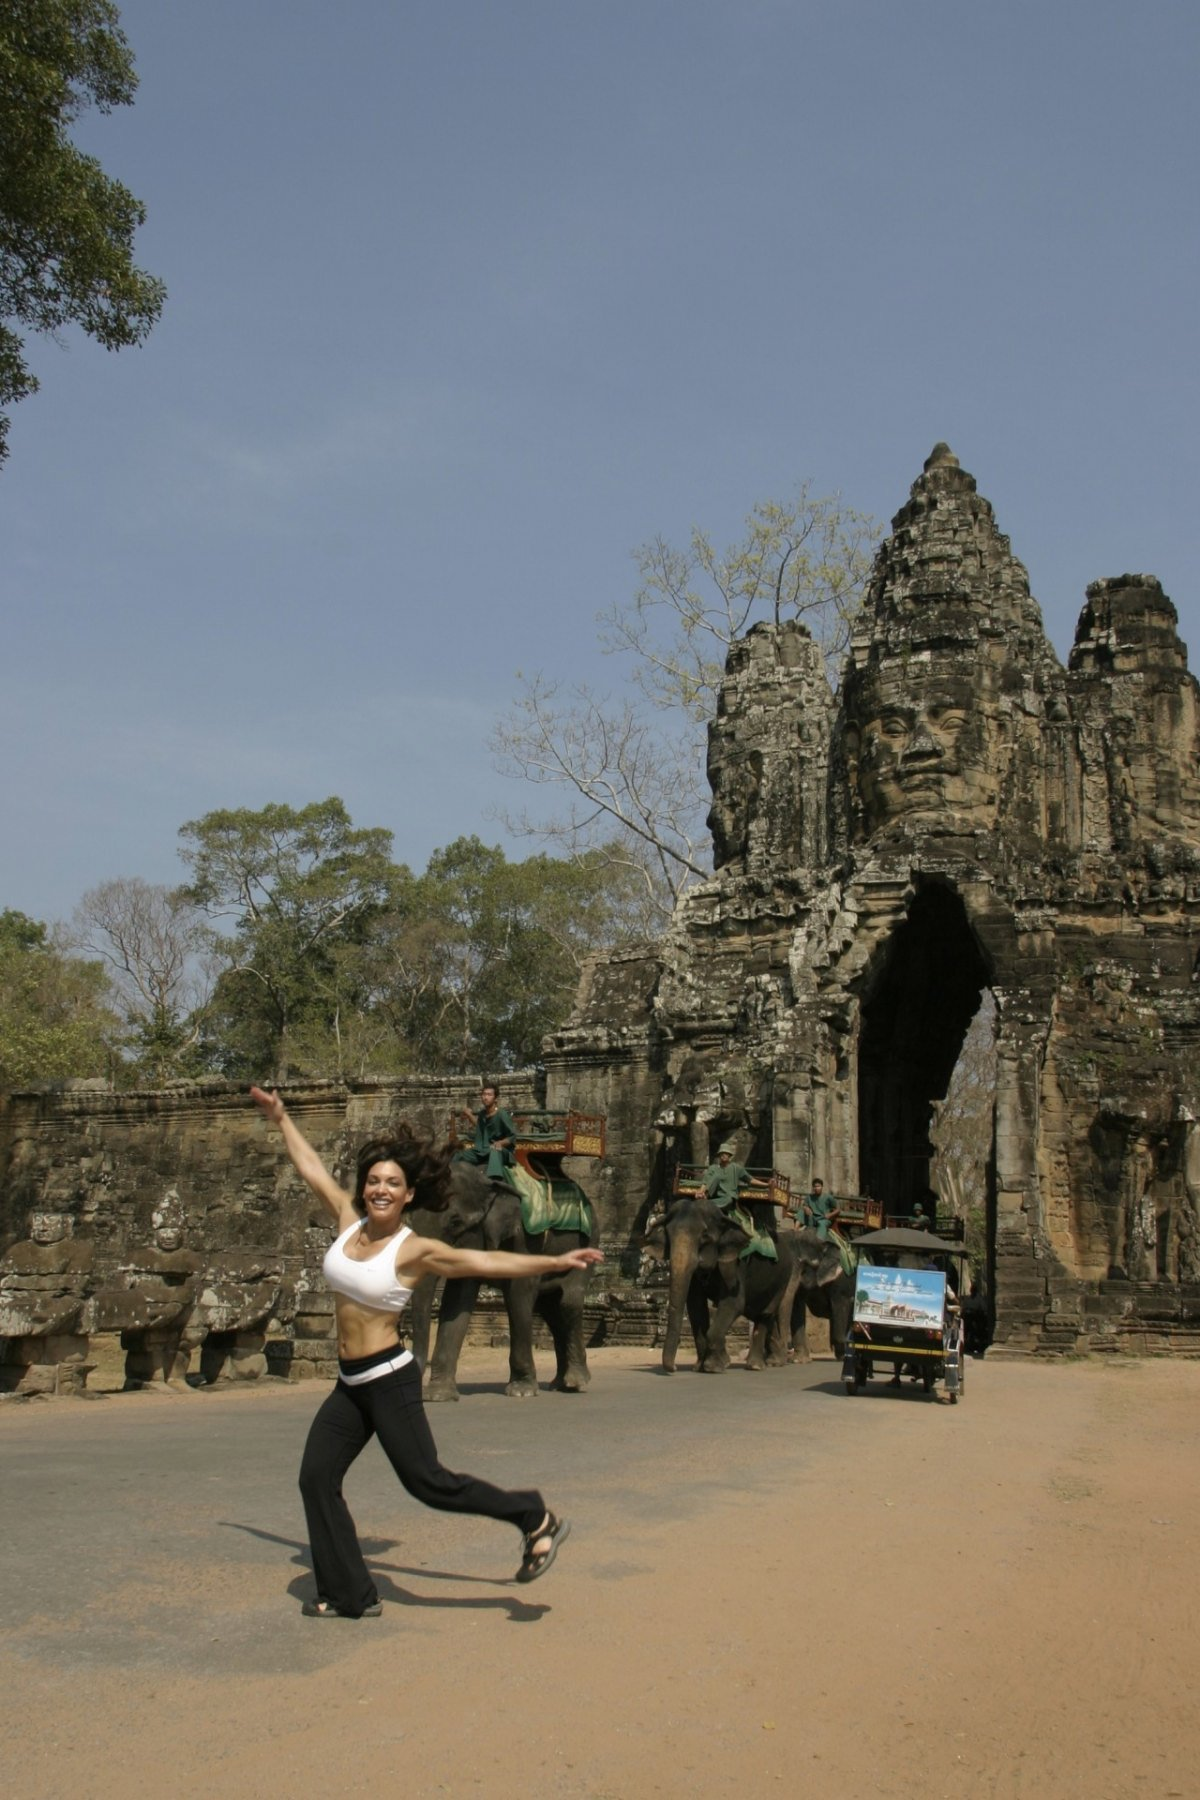 cat-jumping-i-f-o-gate-cambodia10-23-2011